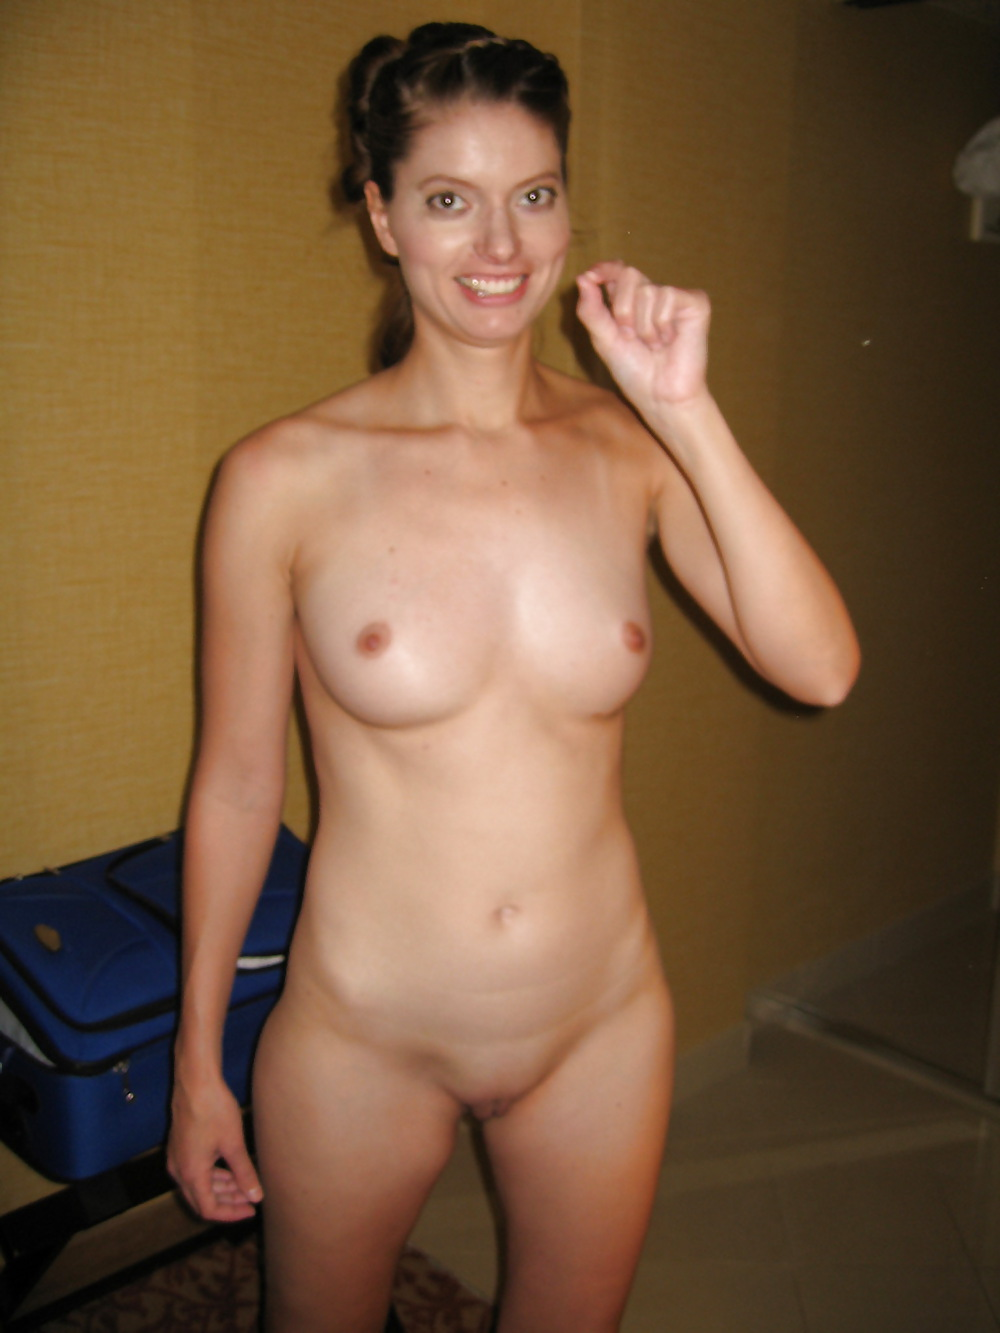 Backyard nudist picture